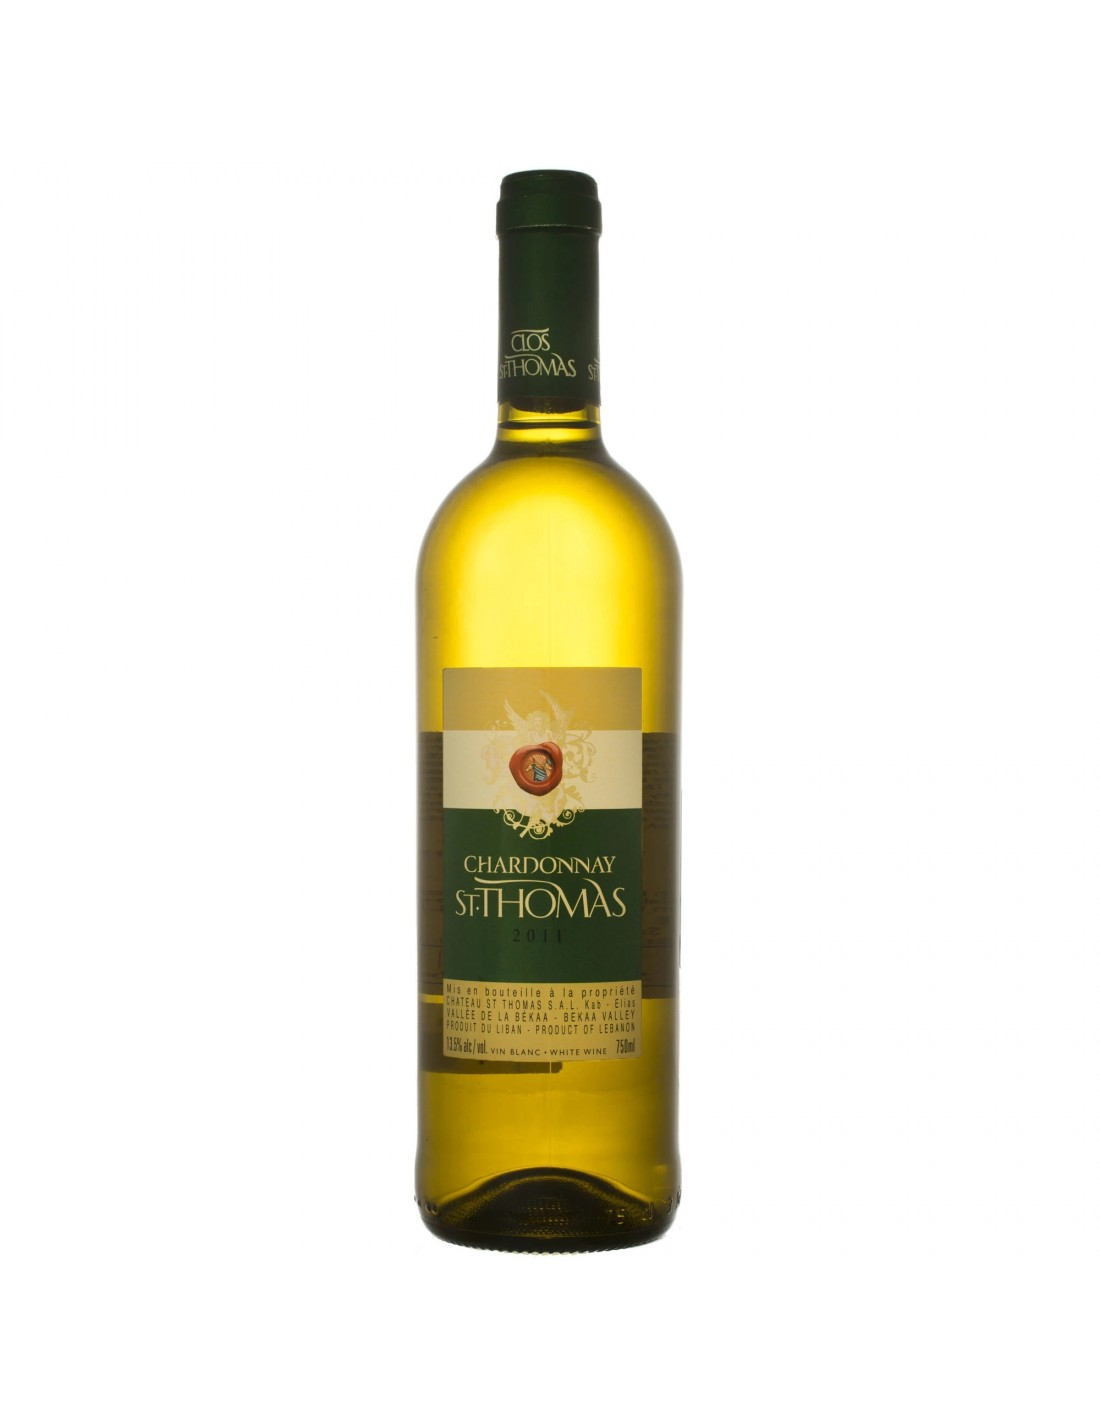 Vin alb sec, Chardonnay, St. Thomas, 14.5% alc., 0.75L, Liban